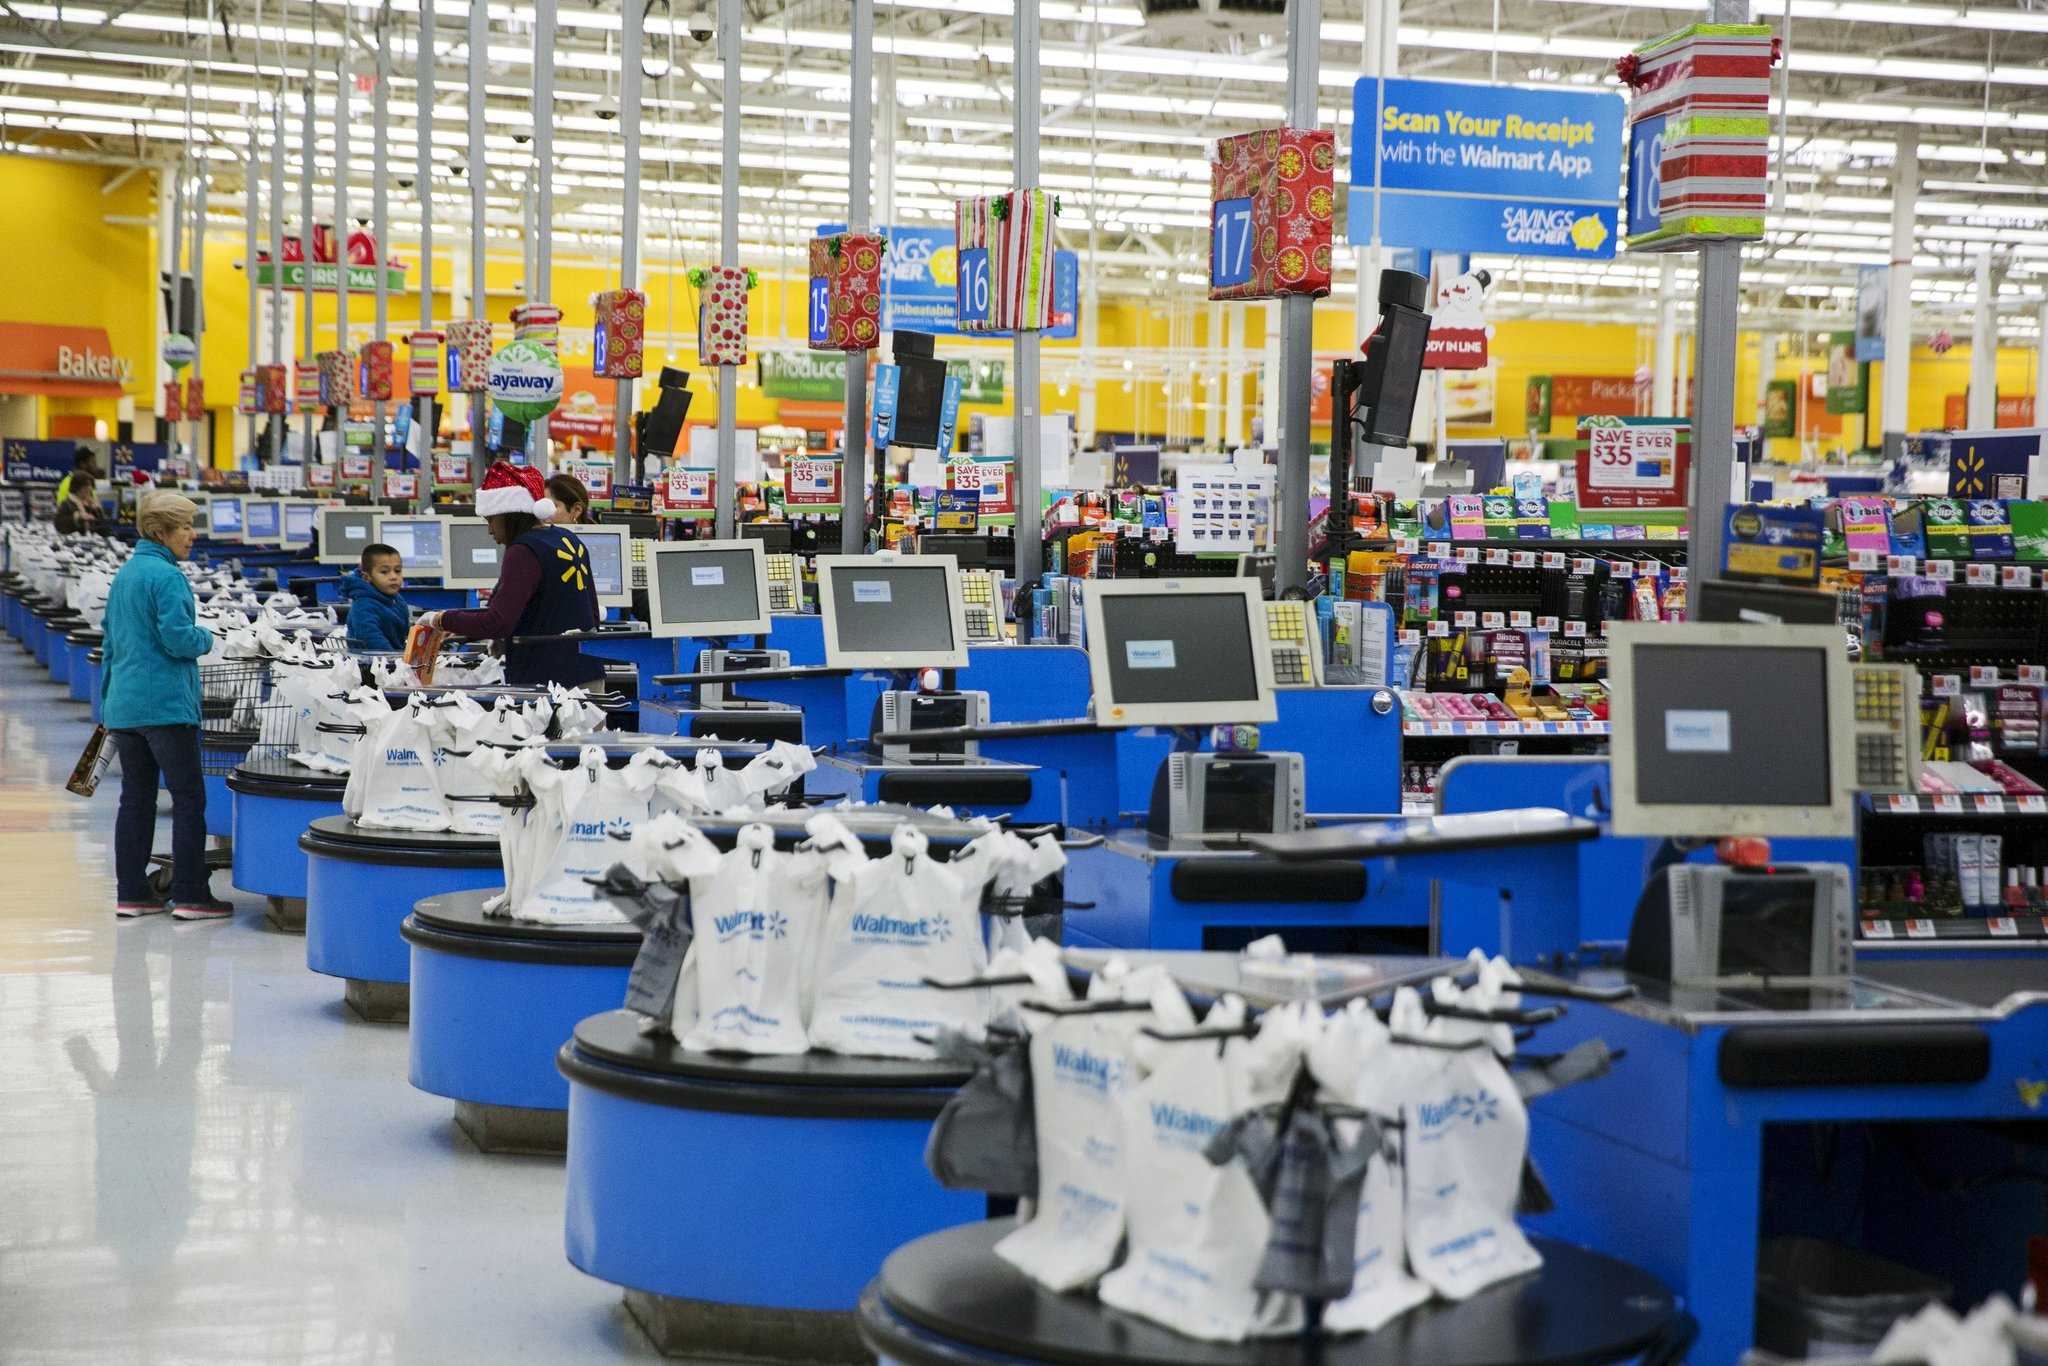 Walmart Profit Fell Almost 8% in 4th Quarter | Red Dragon